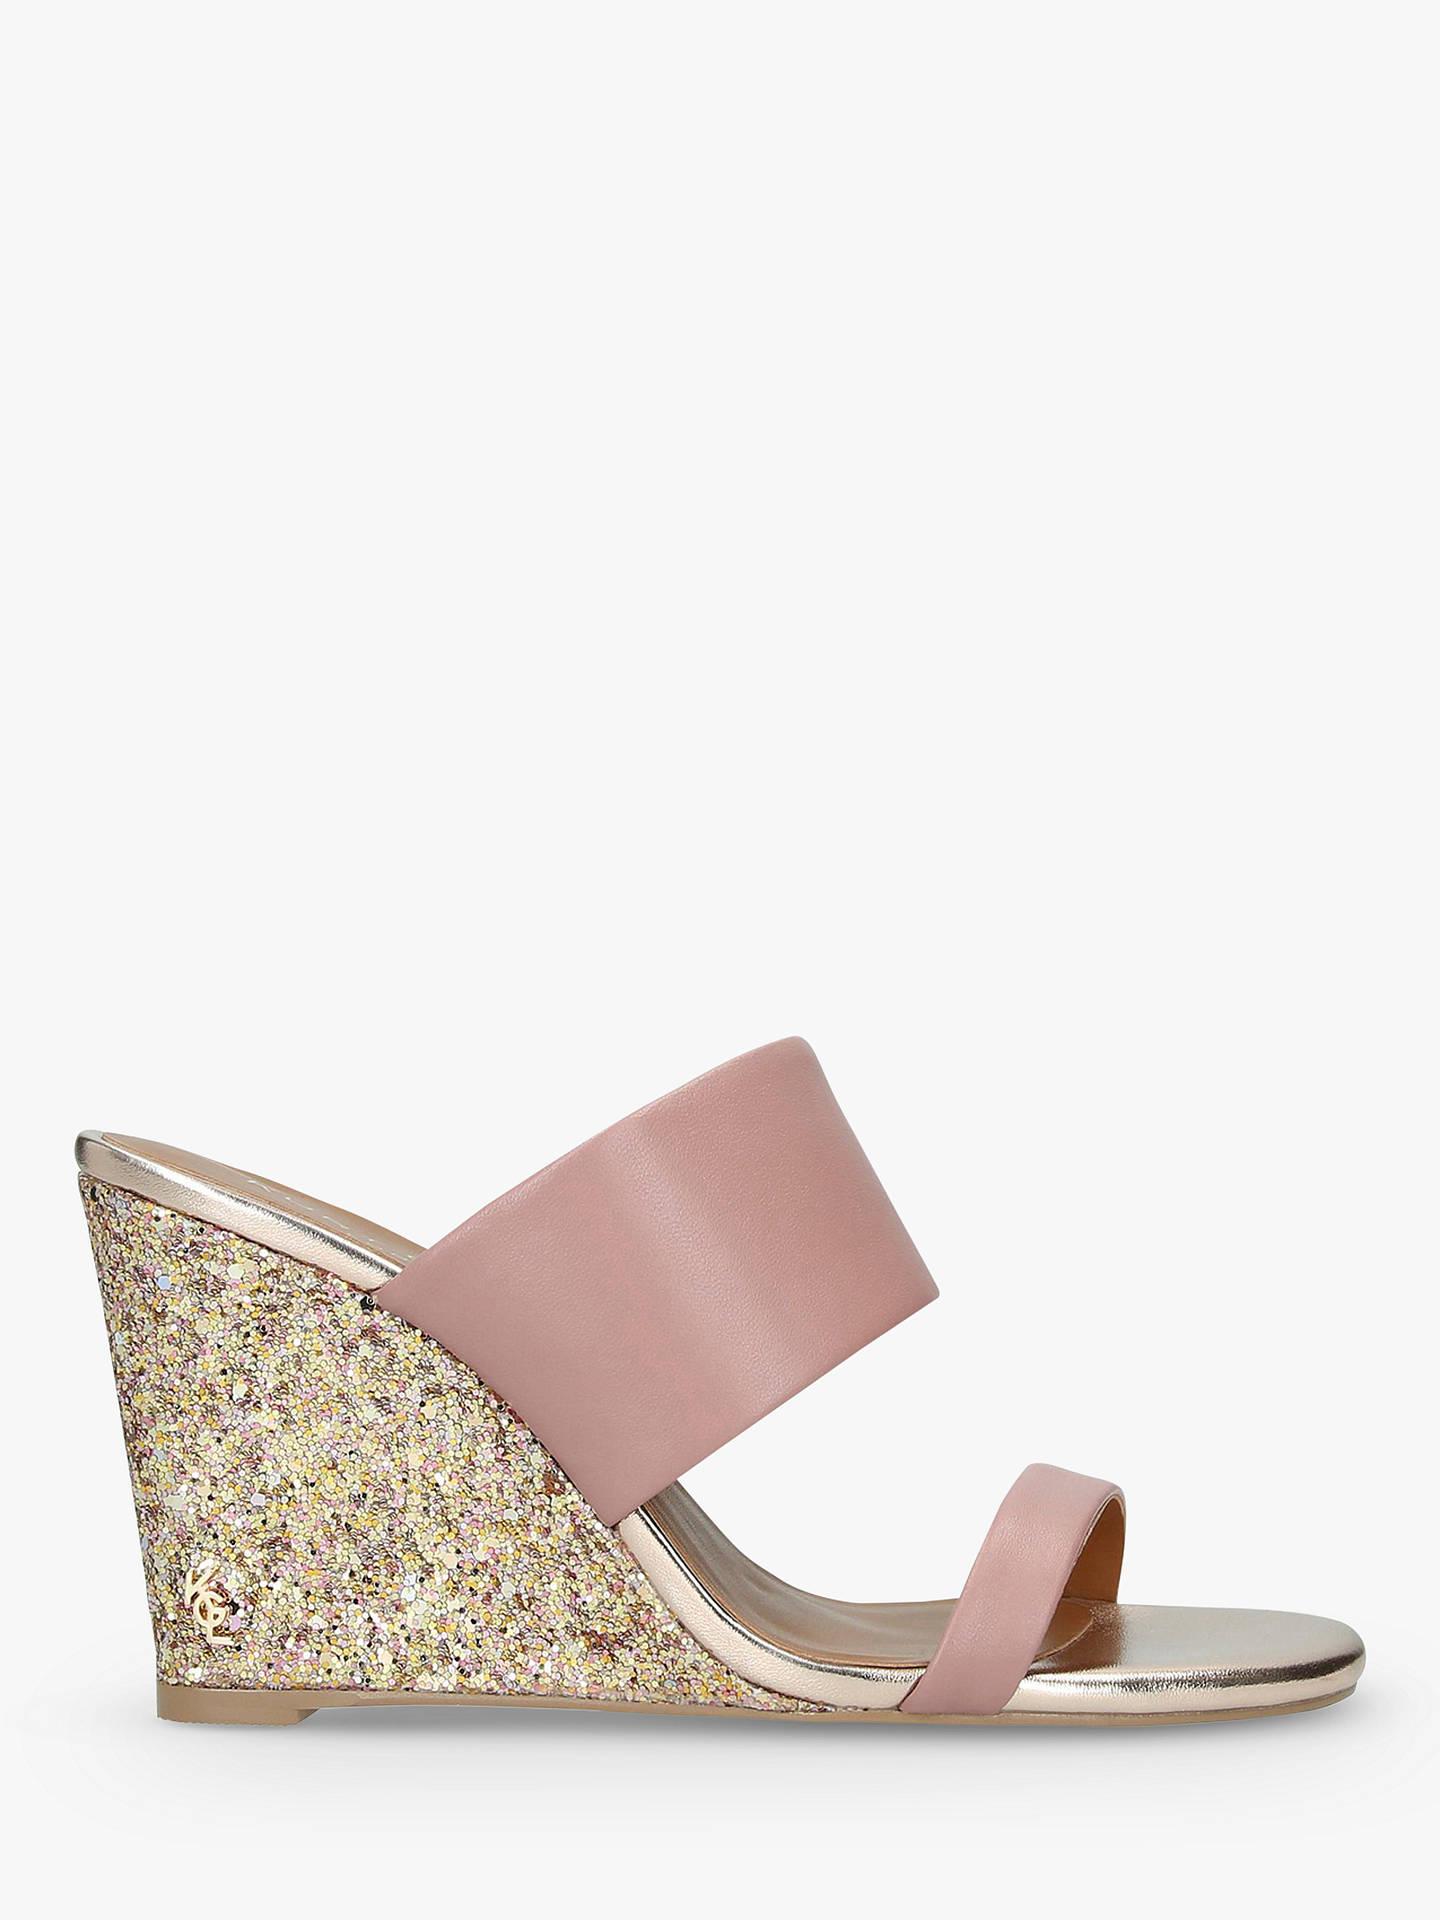 97396854127 Buy Kurt Geiger London Charing Wedge Heel Sandals